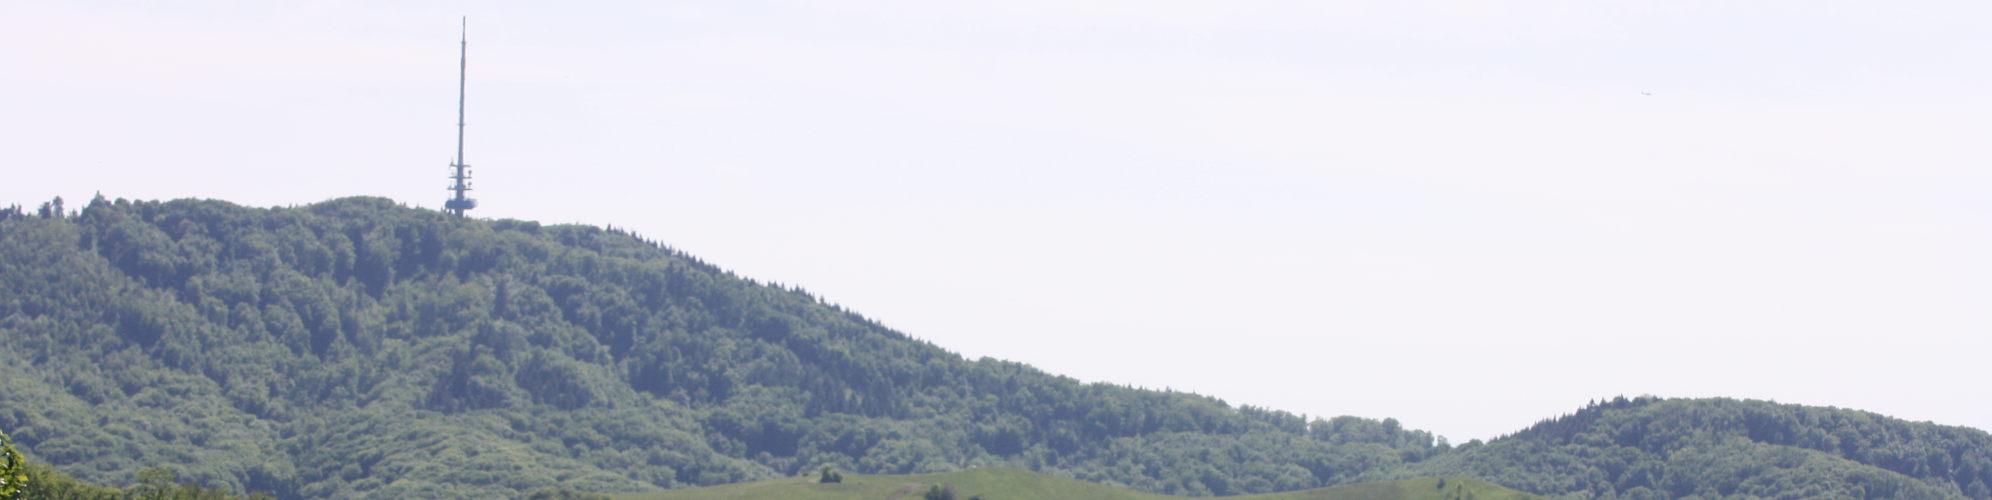 Themenpfad am Kaiserstuhl - Neunlindenpfad